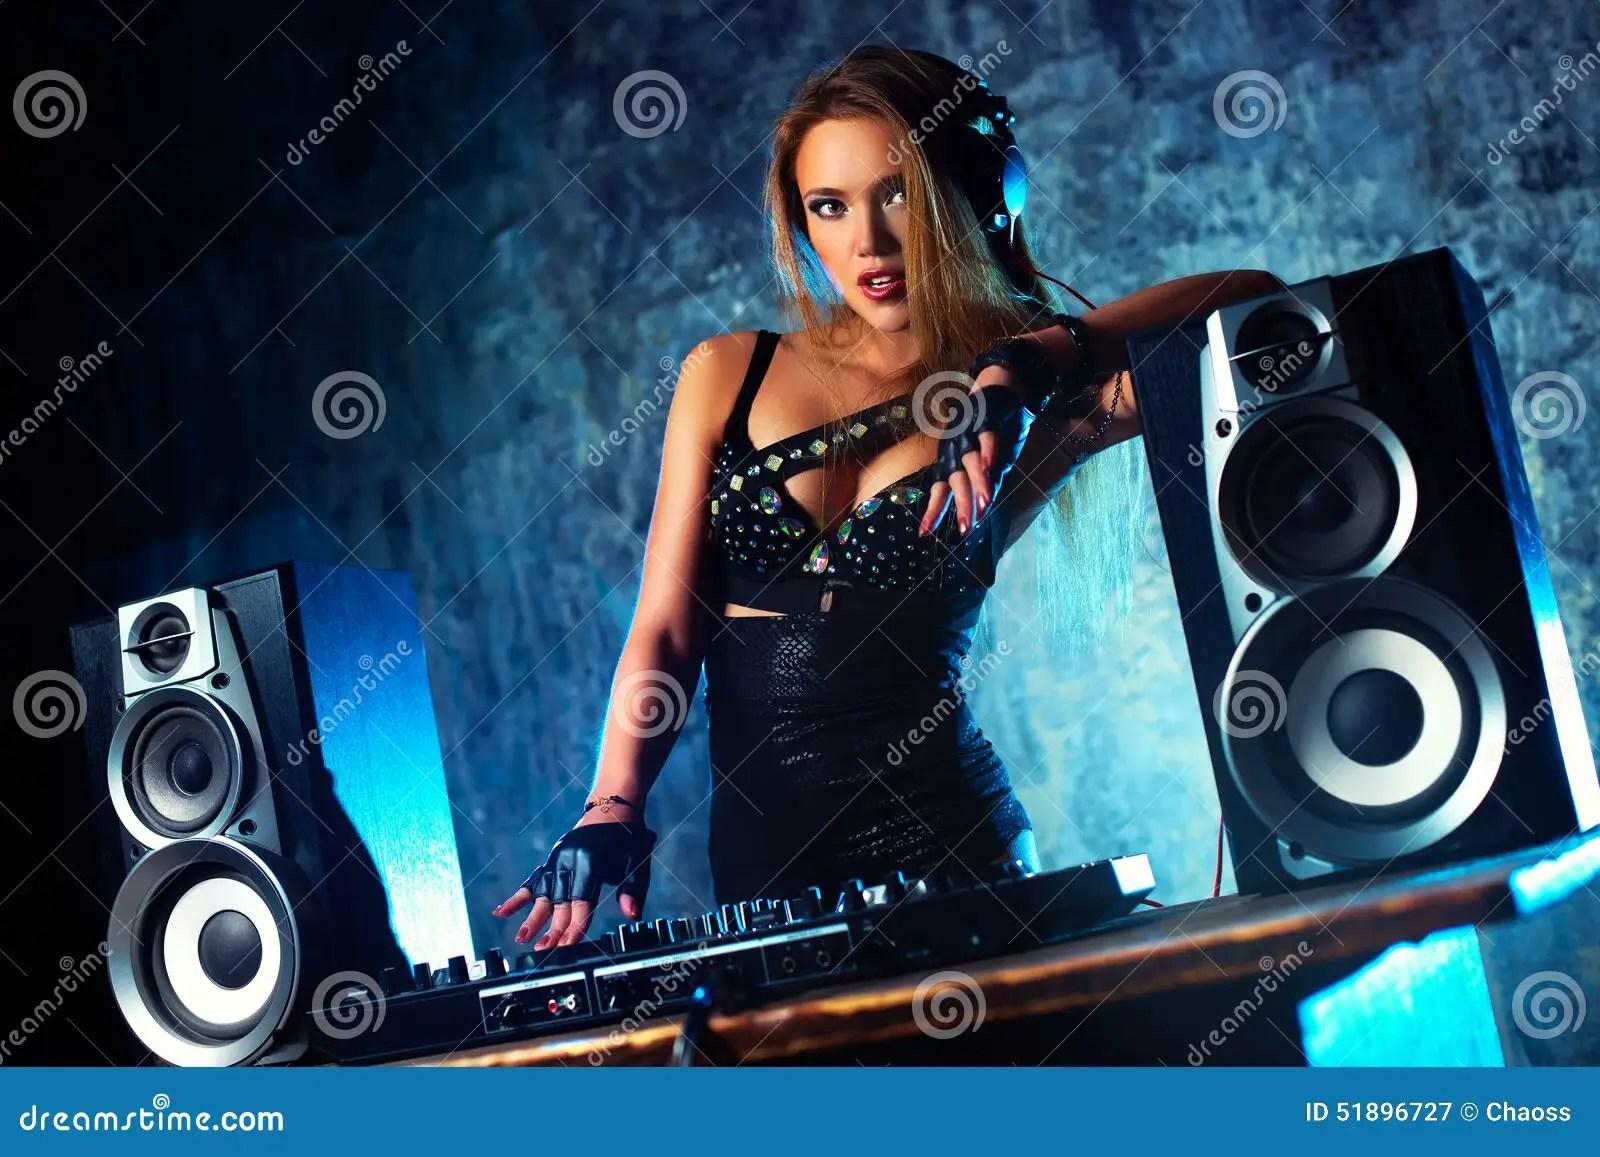 Wallpaper Djs Girl Woman Dj Stock Image Image Of Attractive Night